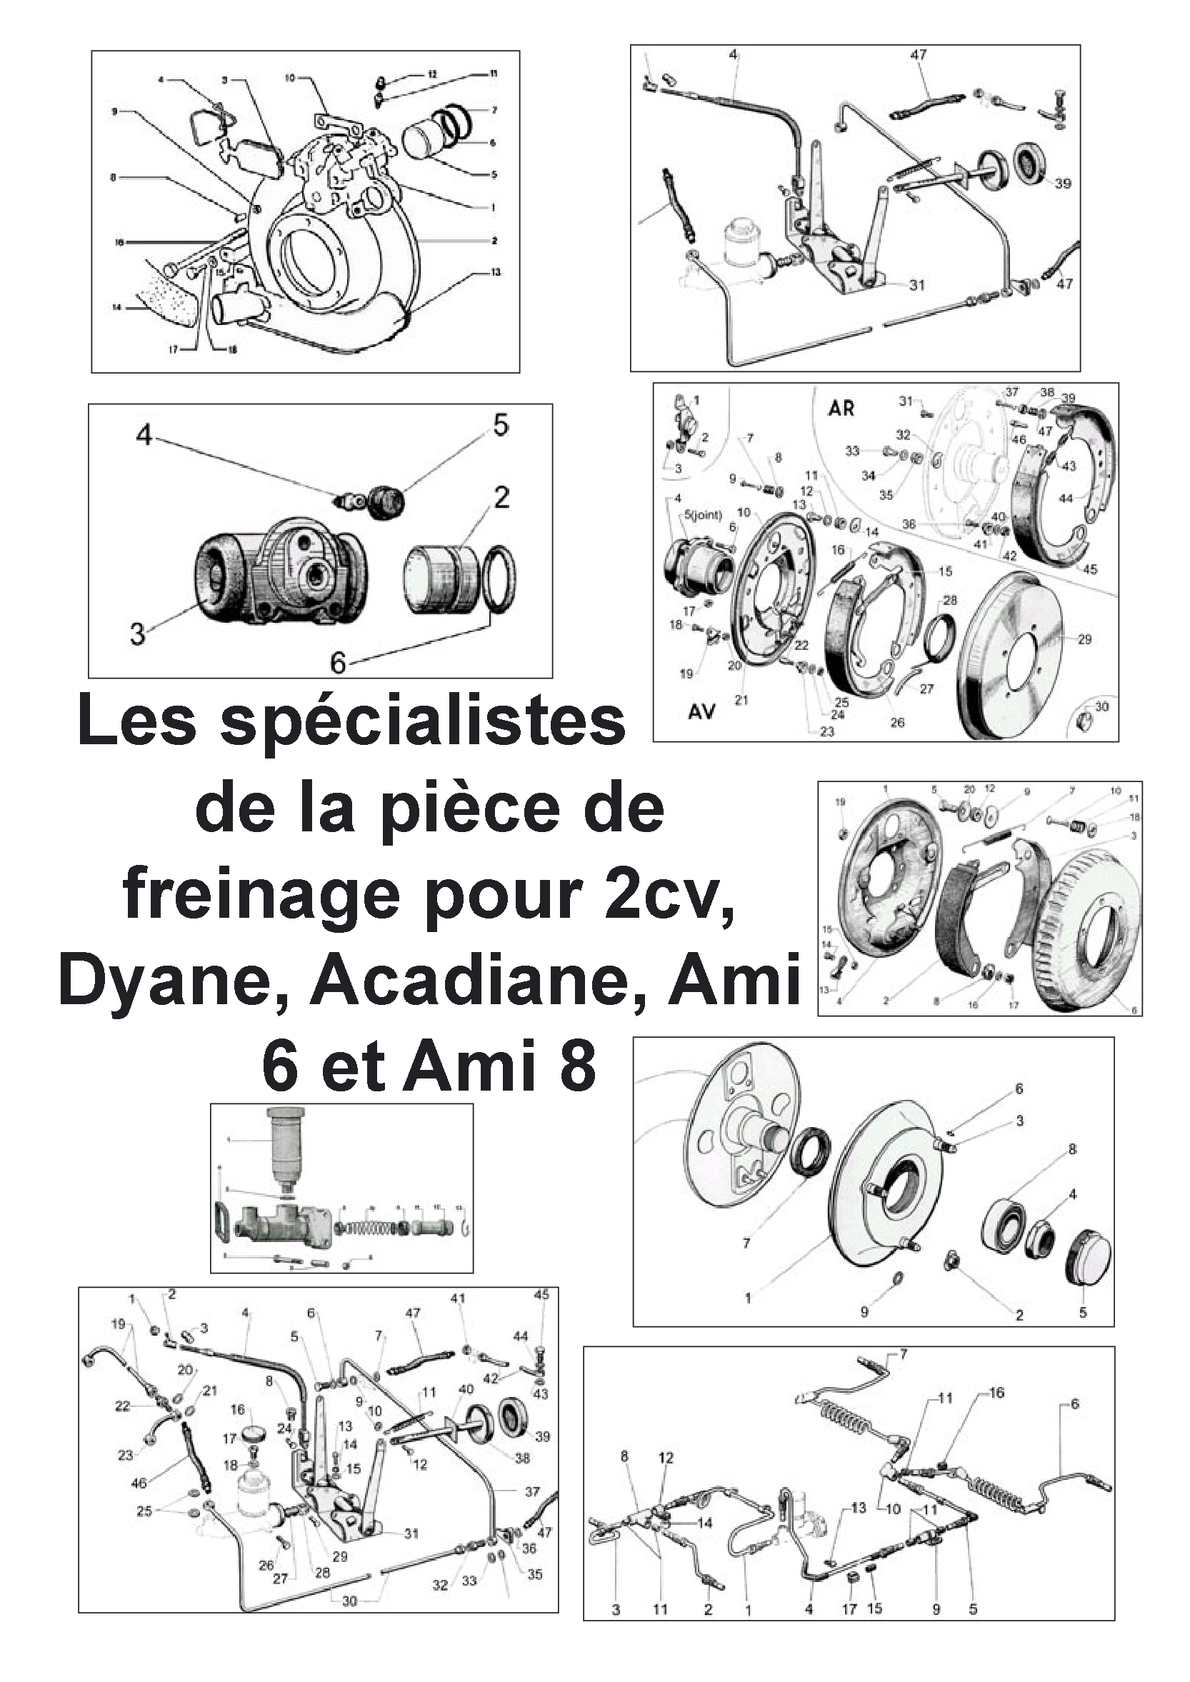 calam o catalogue special pieces de freinage pour 2cv dyane acadiane mehari ami 6 et ami 8. Black Bedroom Furniture Sets. Home Design Ideas